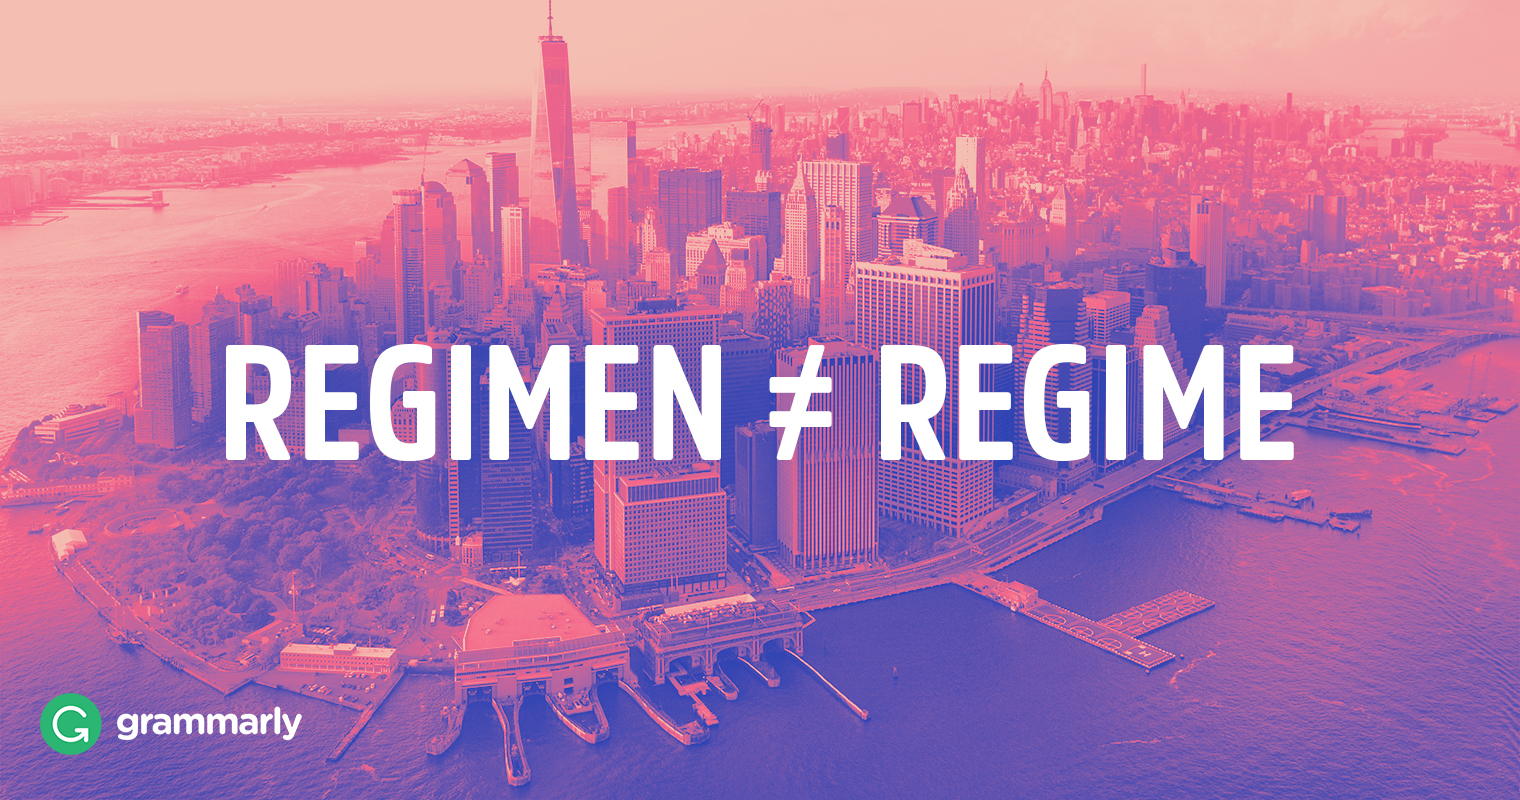 Regimen ≠ Regime